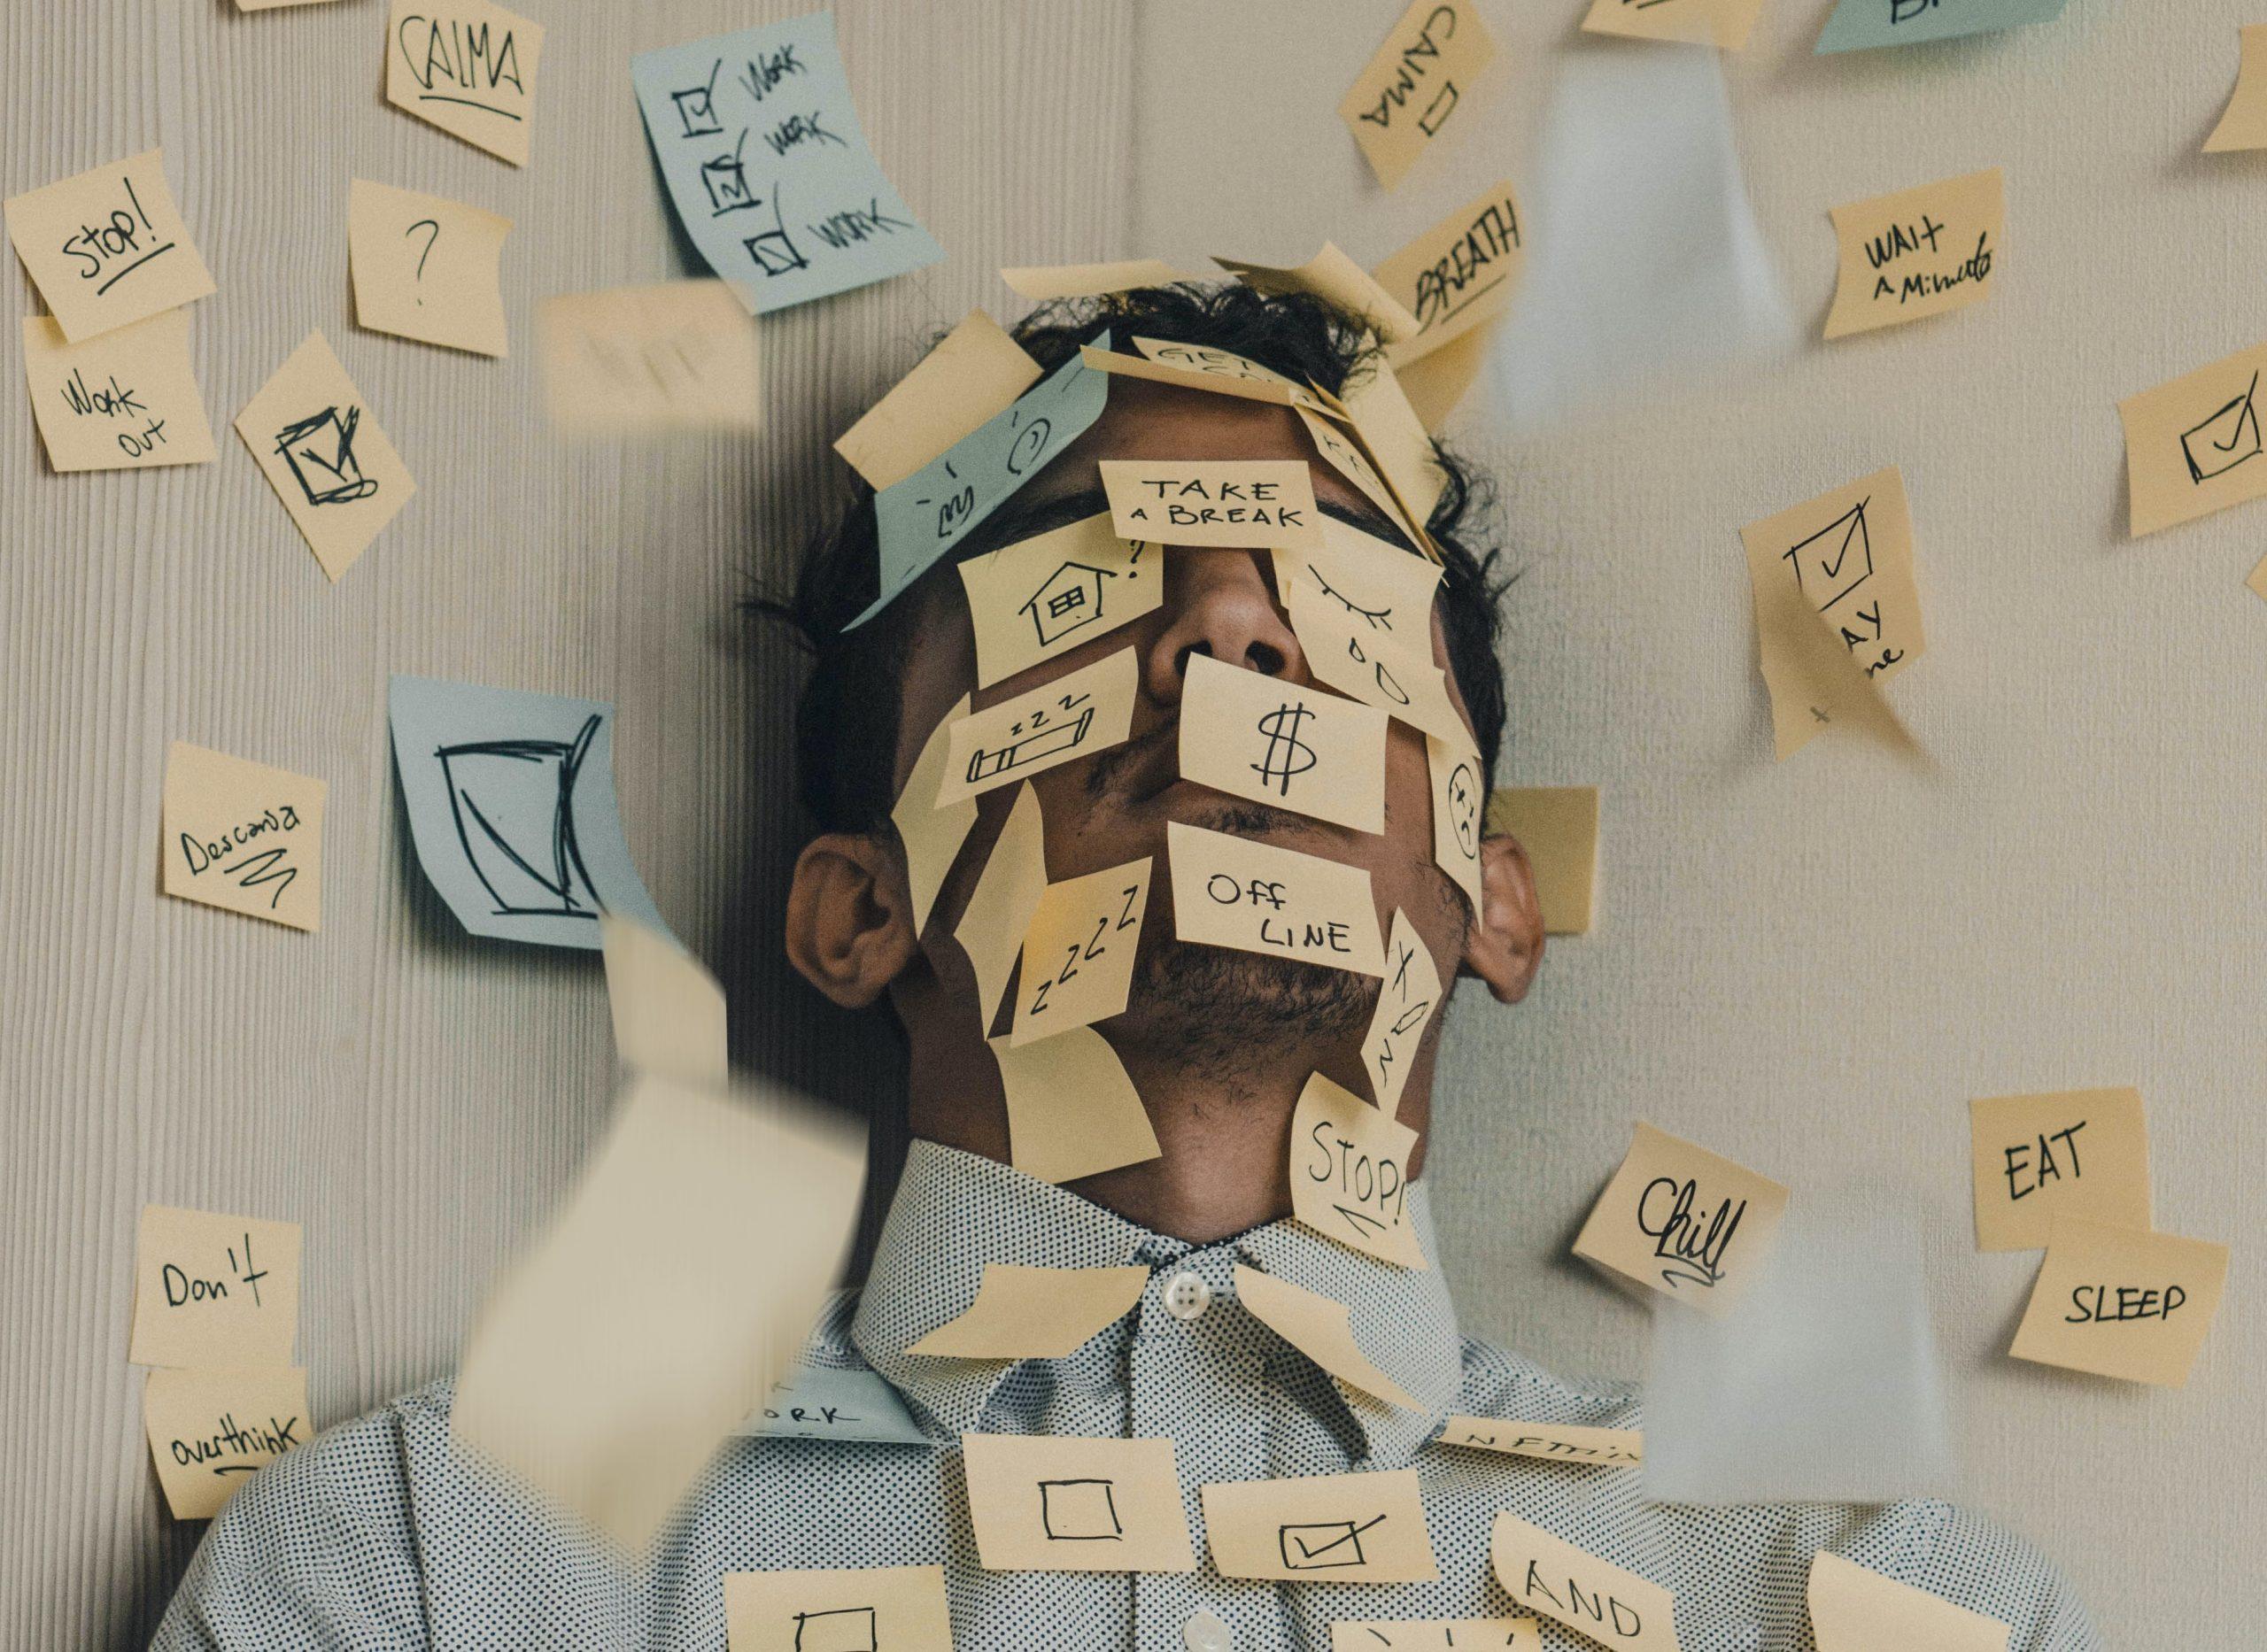 Fotografia muža oblepeného post-it papierikmi, čo symbolizuje stres.